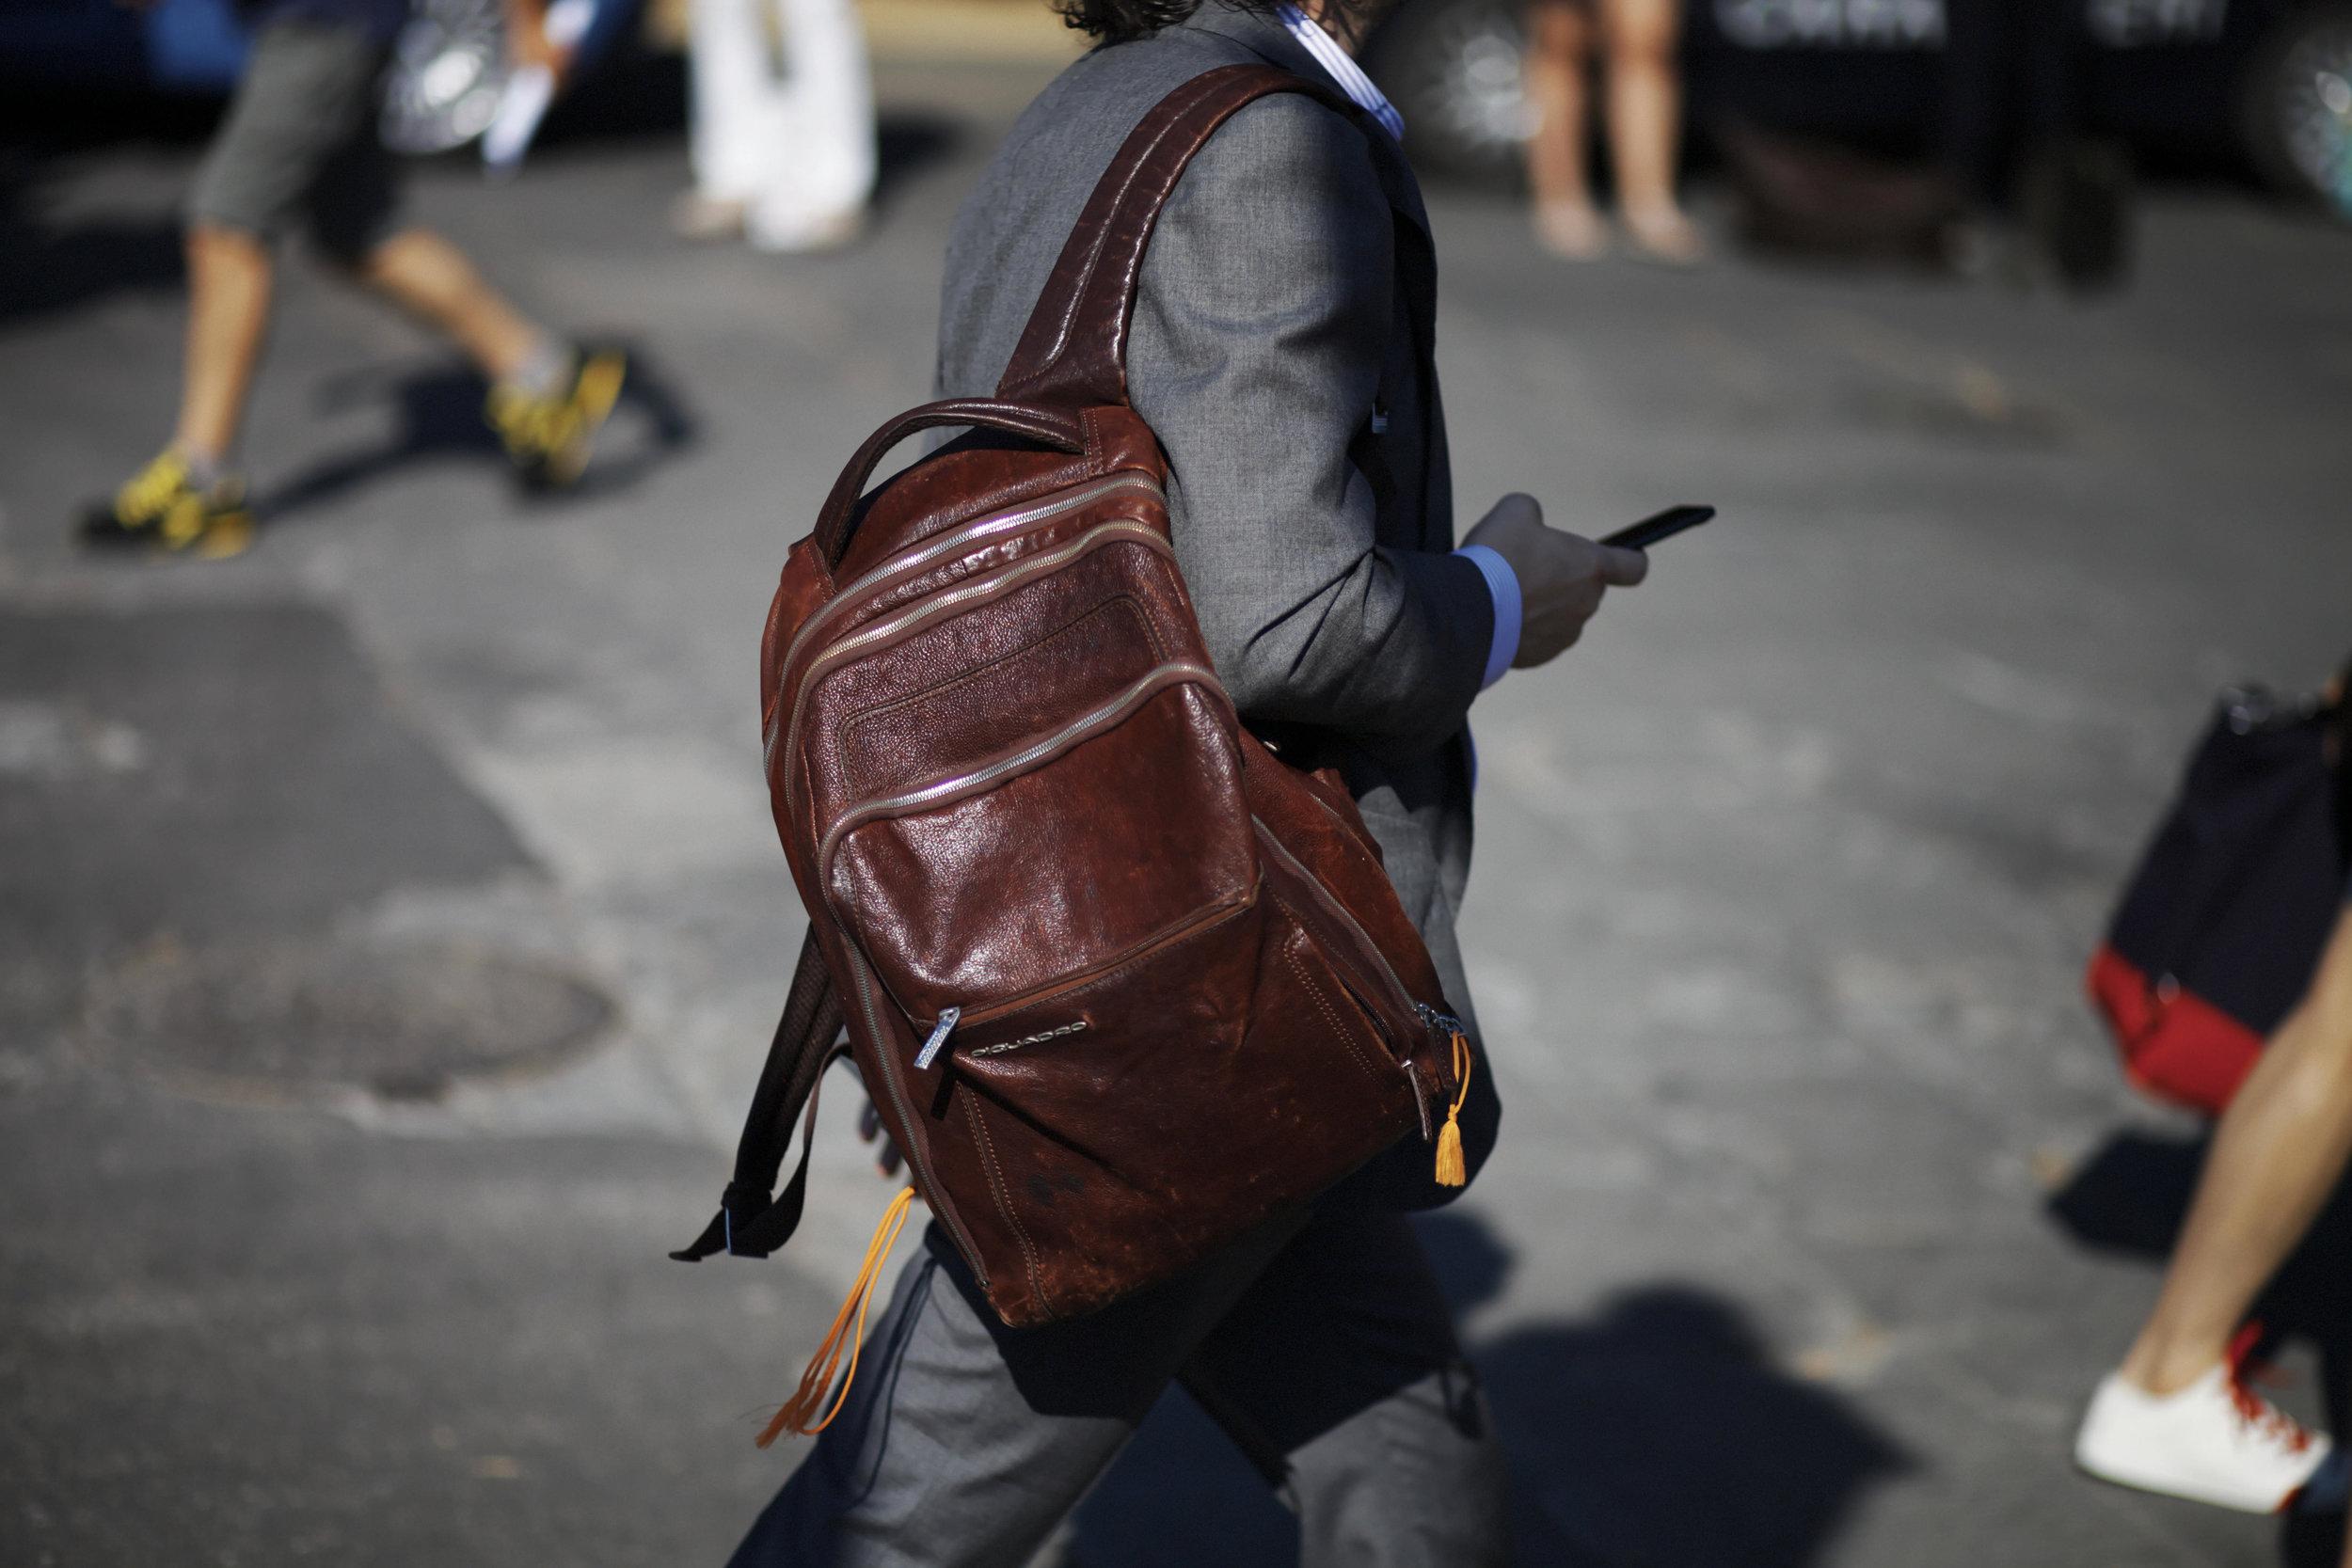 Pitti Uomo les indispensables paris 92 Florence sac cuir leather bag